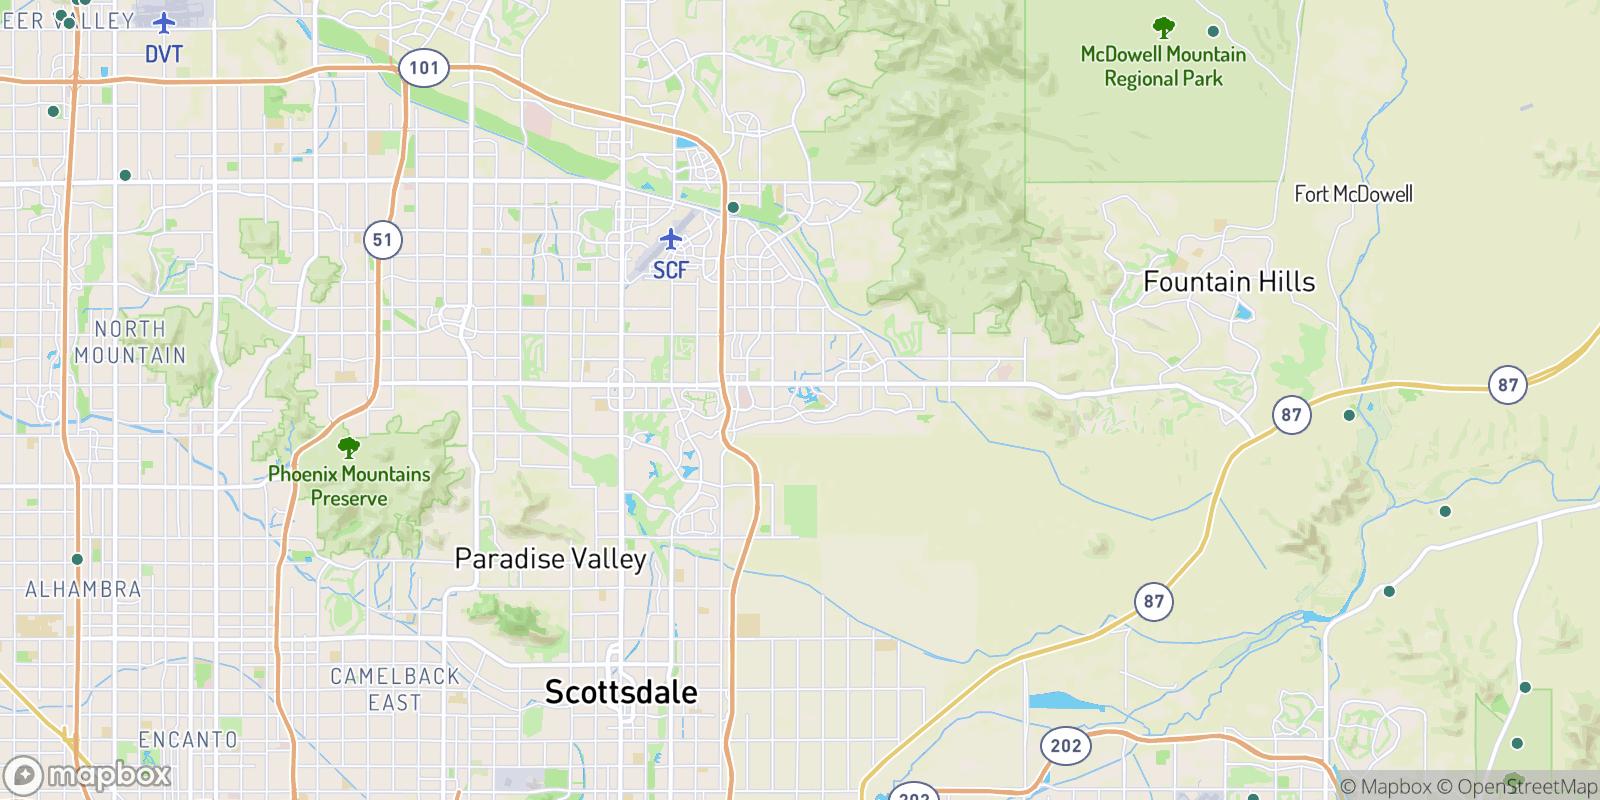 The best camping near Mirador, Arizona